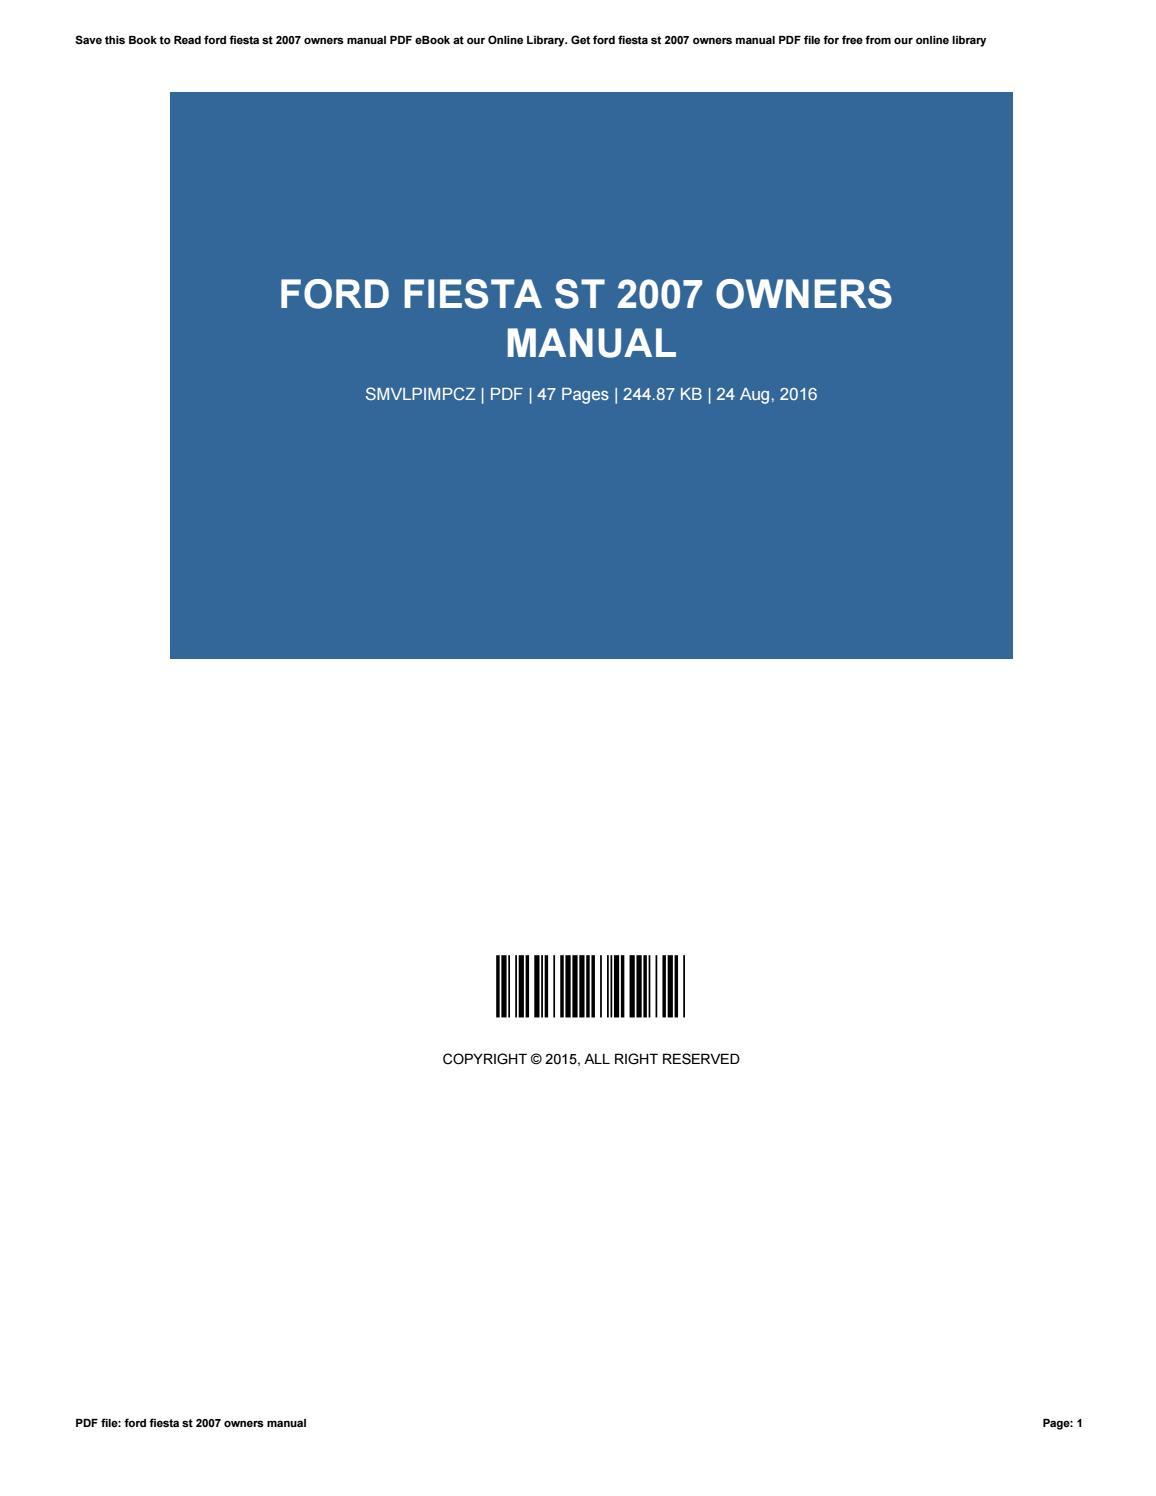 ford fiesta st  owners manual  edwardphillips